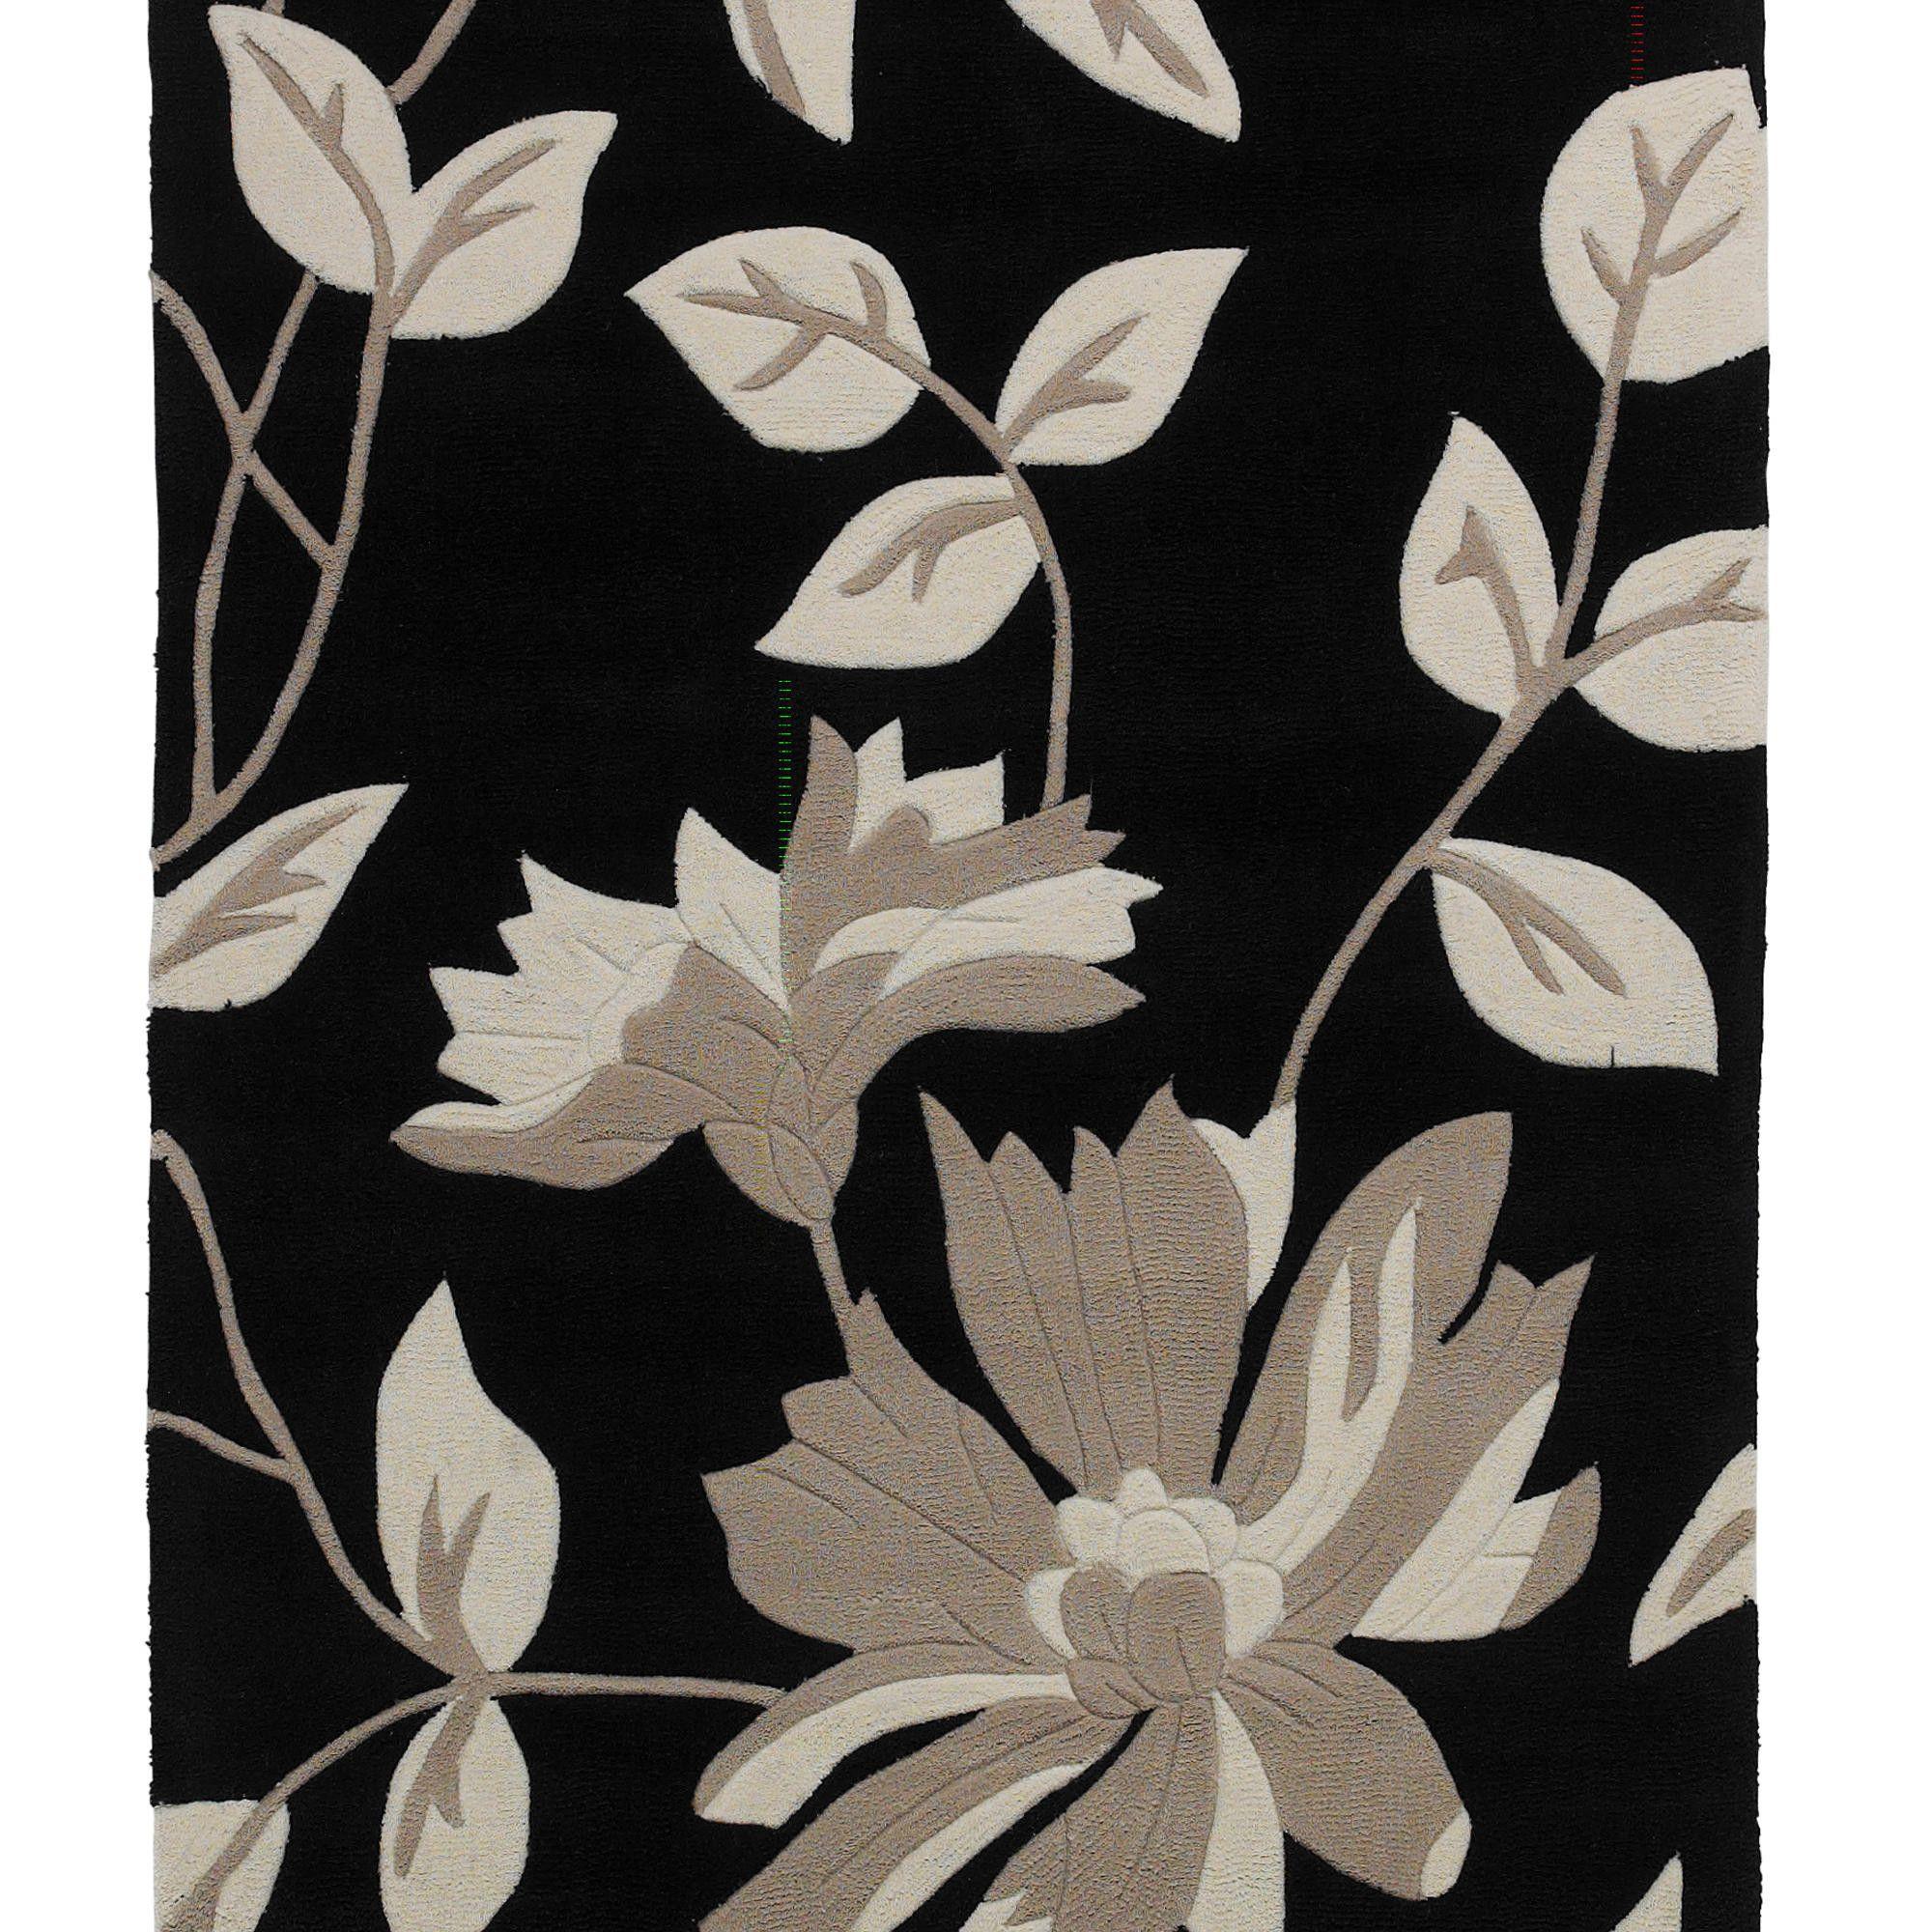 Oriental Carpets & Rugs Hong Kong Black Tufted Rug - 150cm L x 90cm W